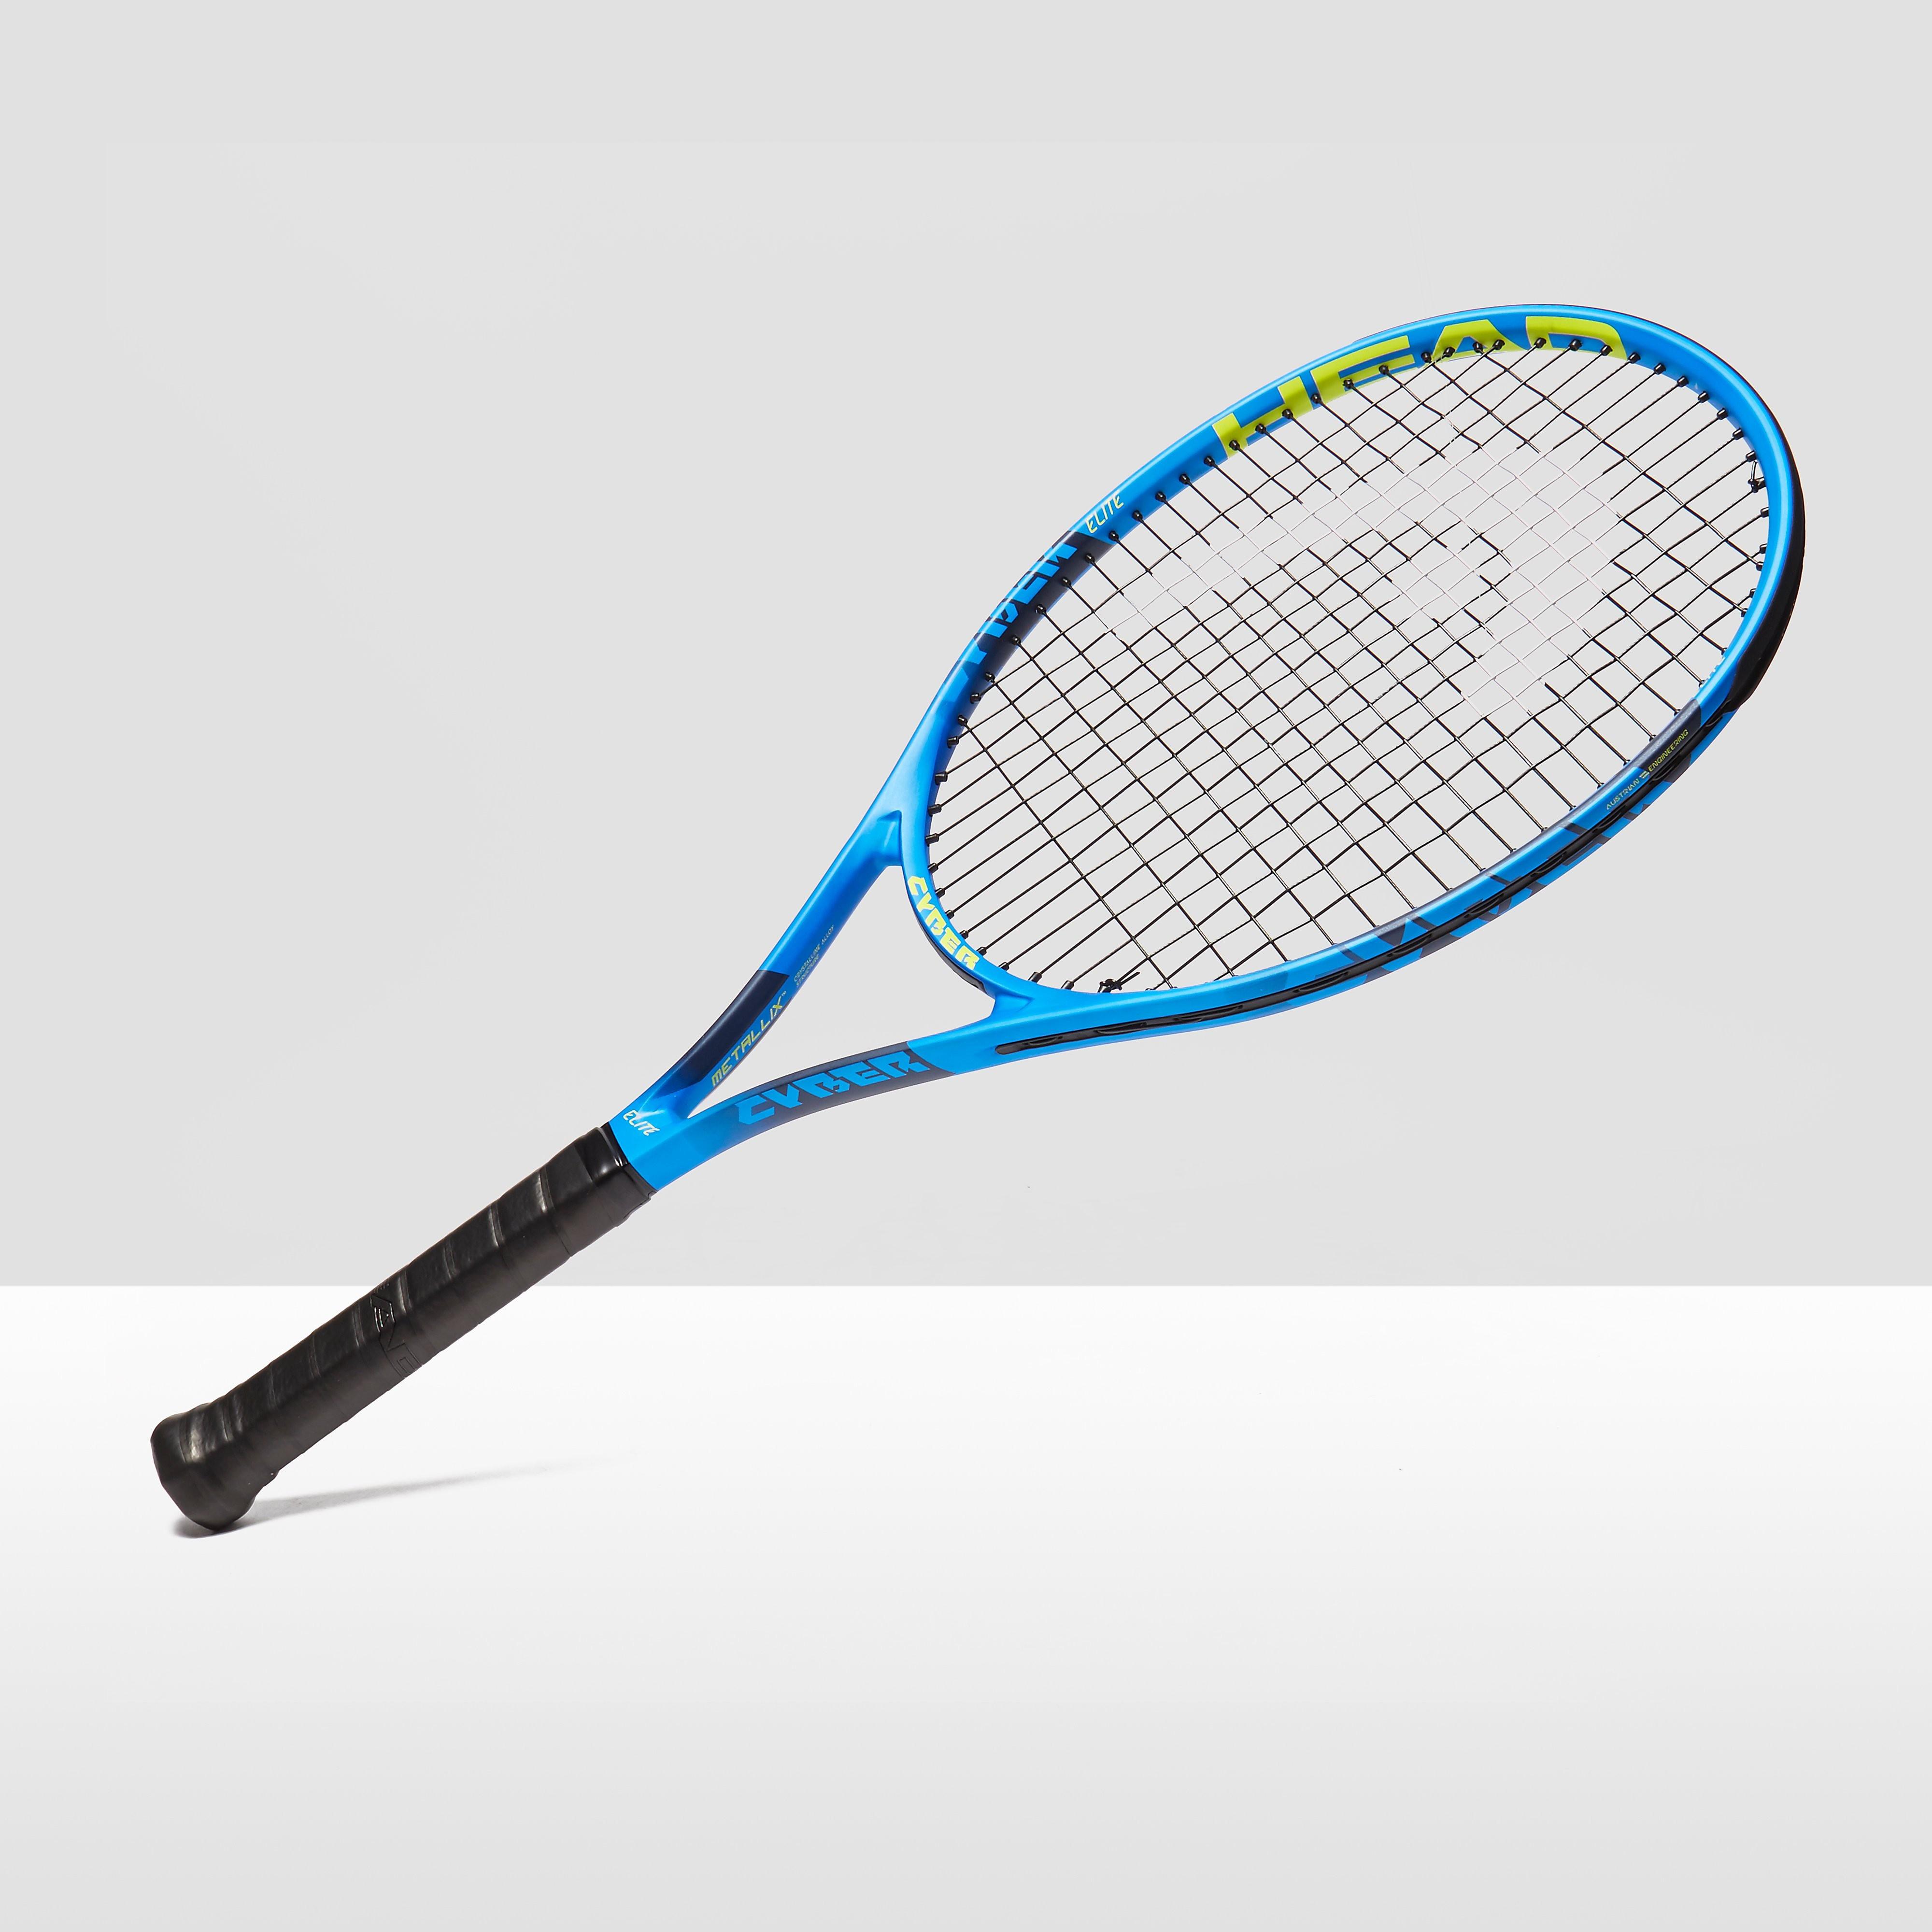 Head Cyber Elite Tennis Racket